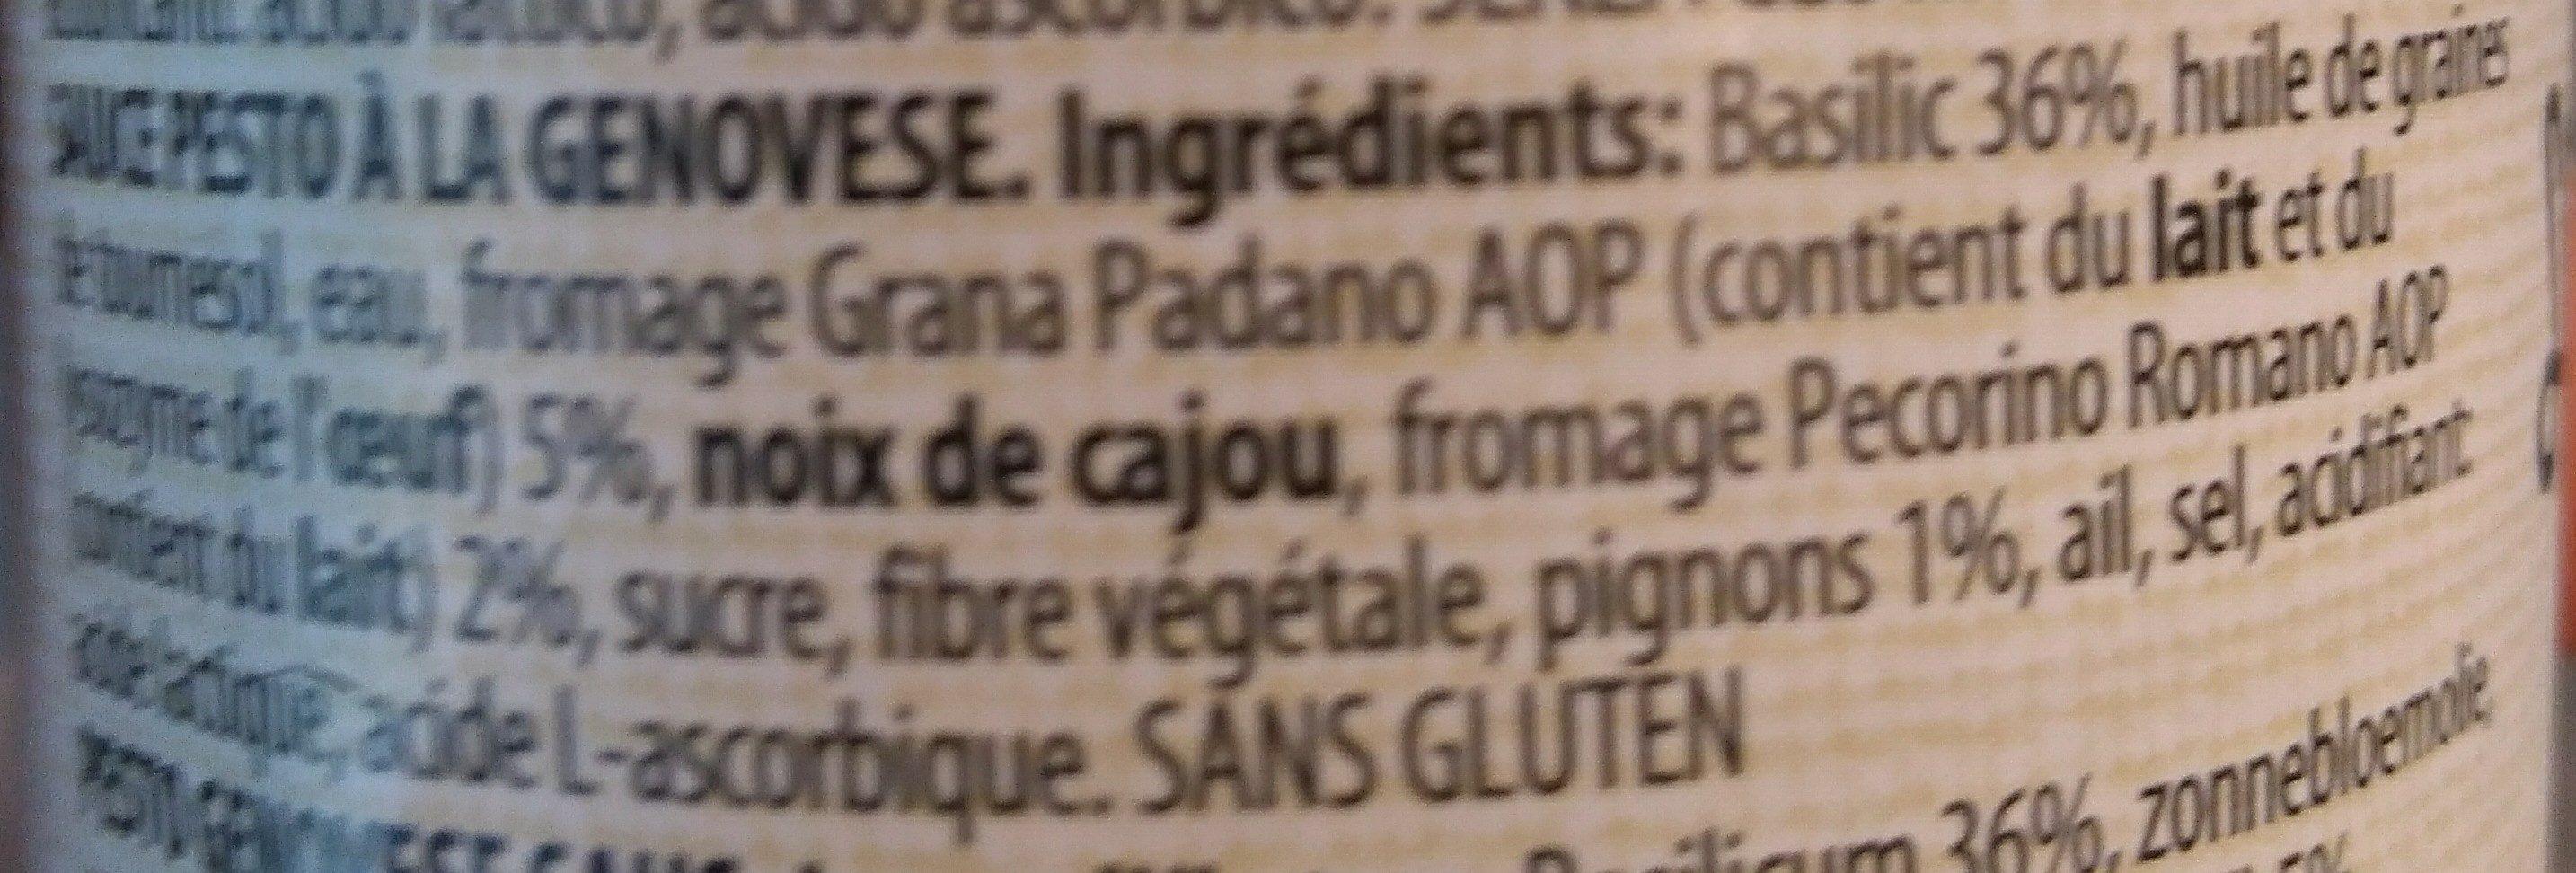 Green Pesto - Ingrédients